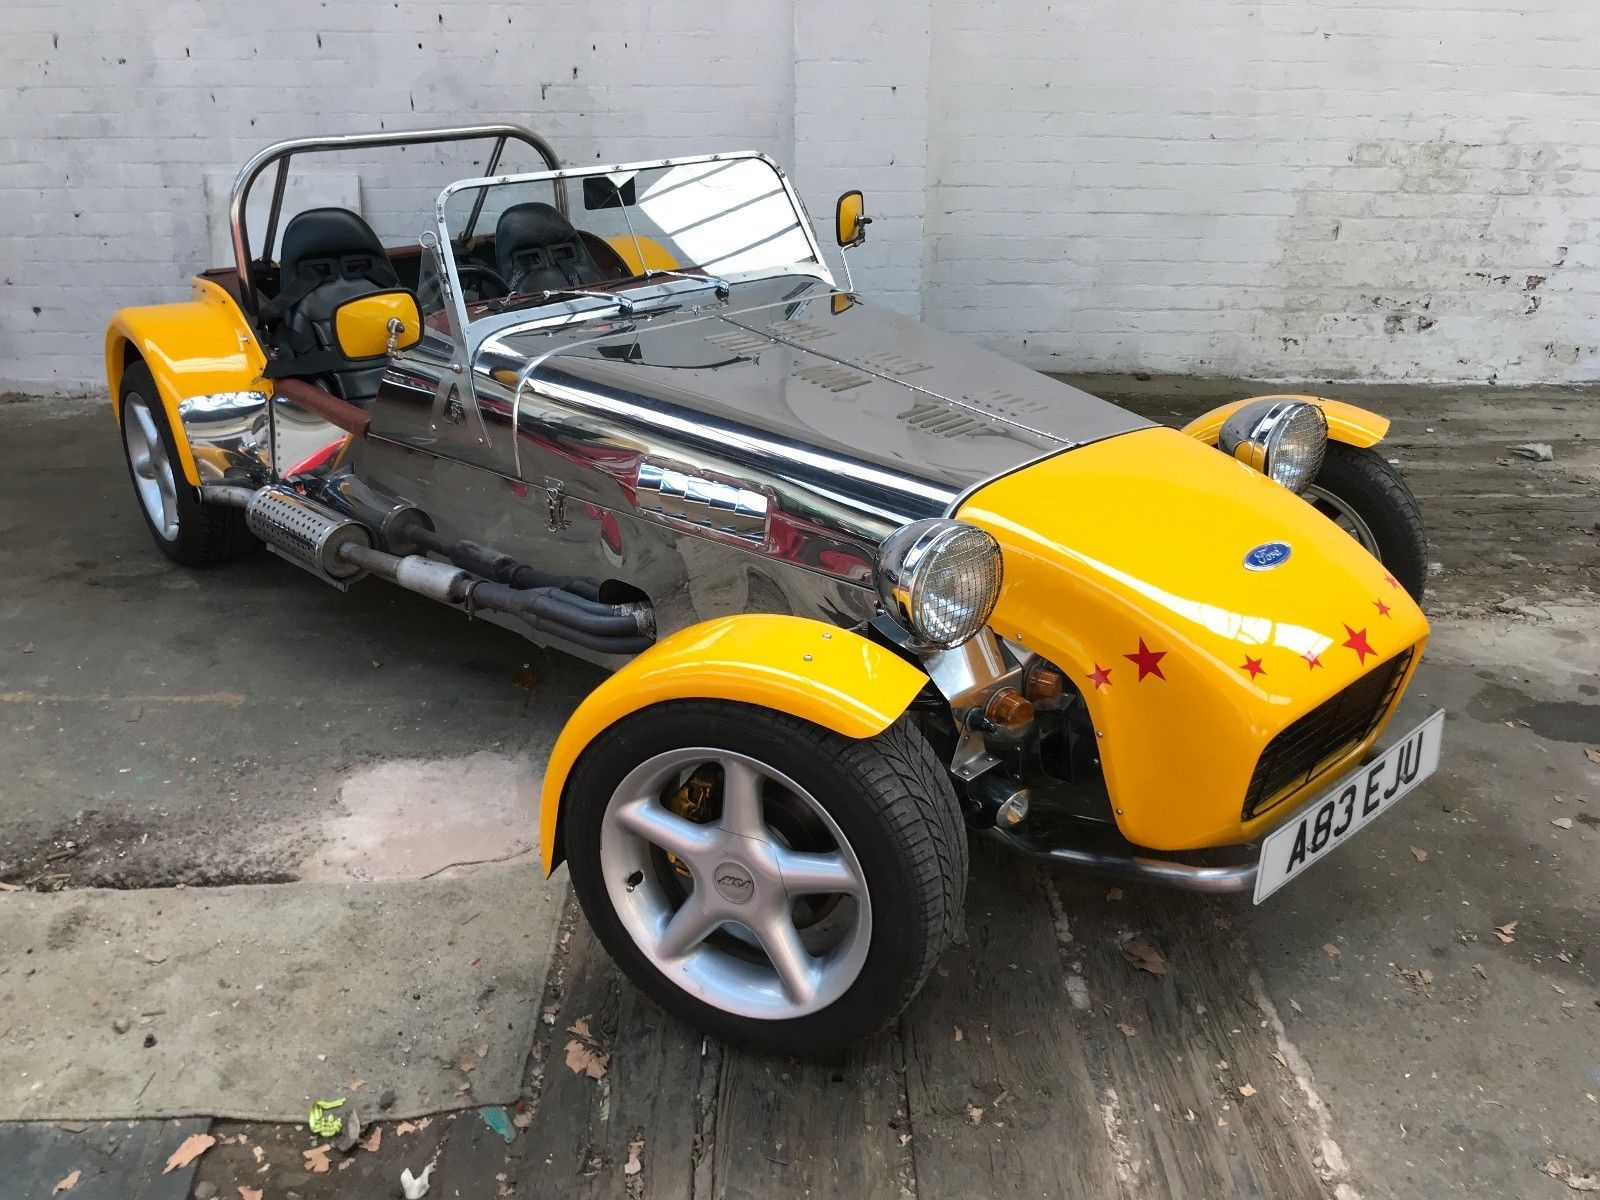 Exceptional Robin Hood Series 3 Kit Car Lotus 7 Replica